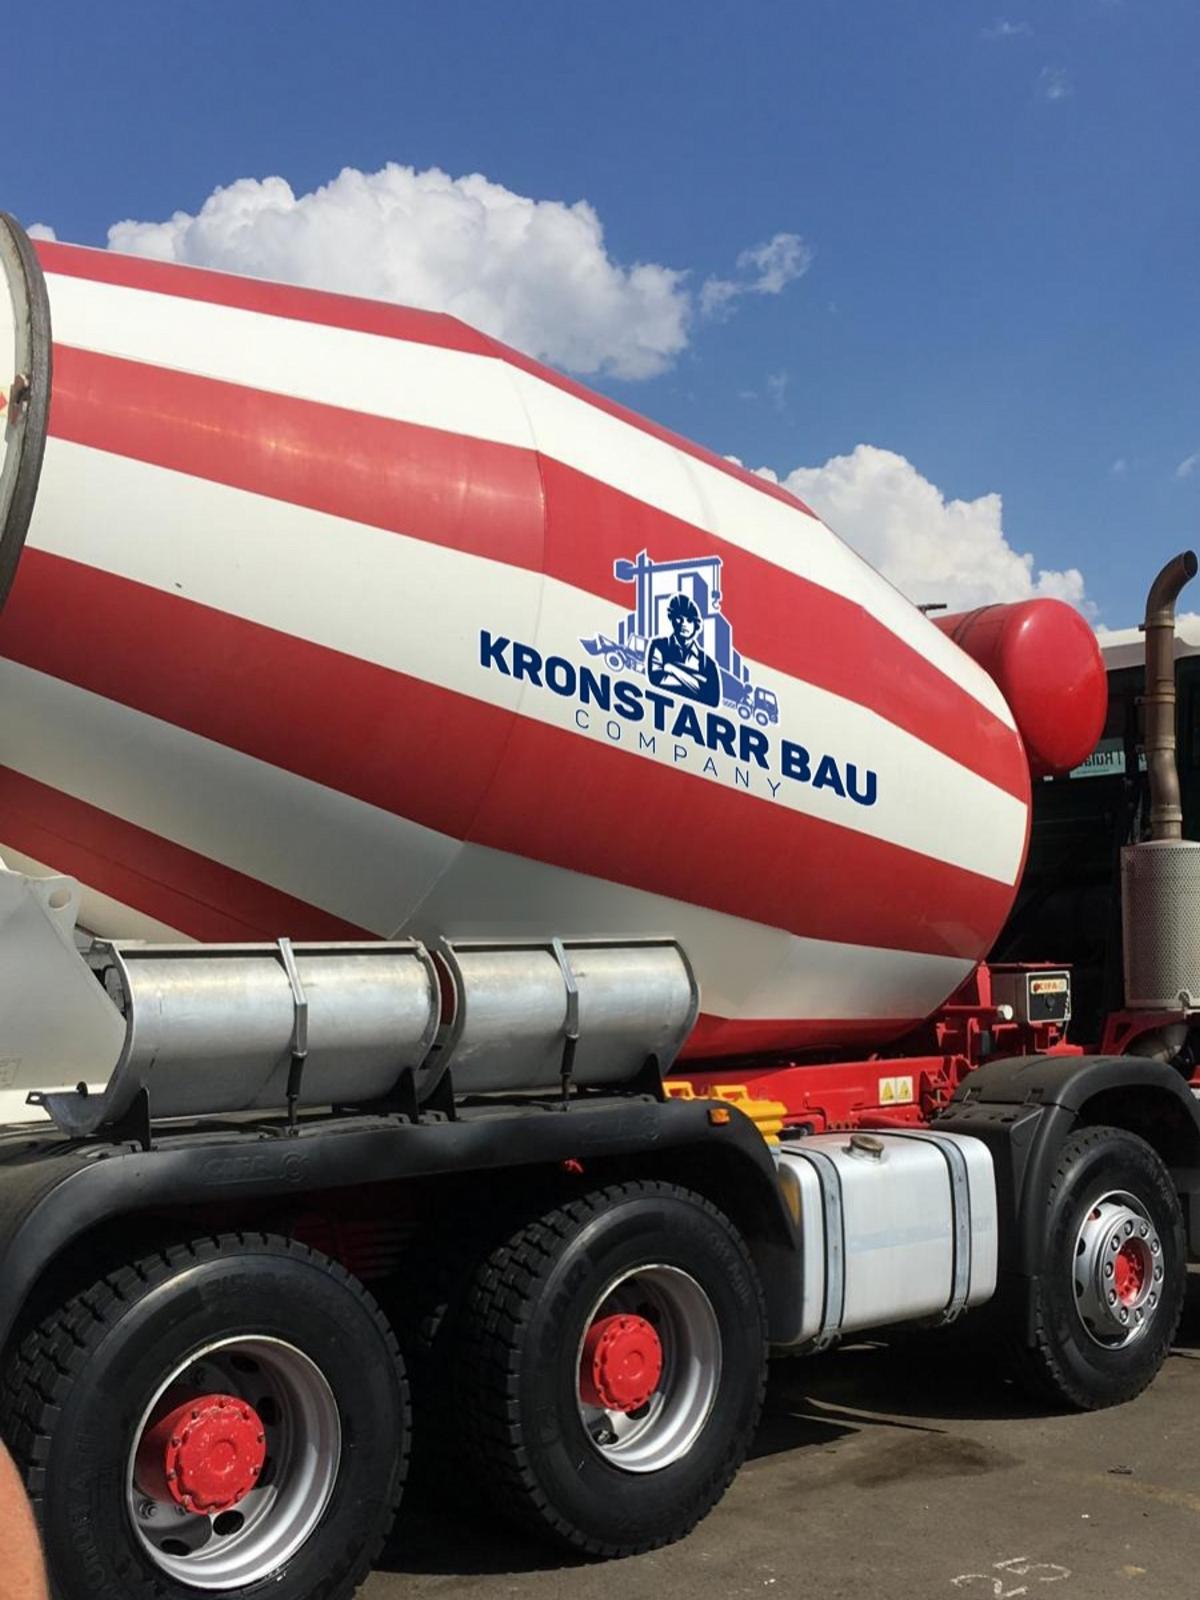 KronstarrBau Company